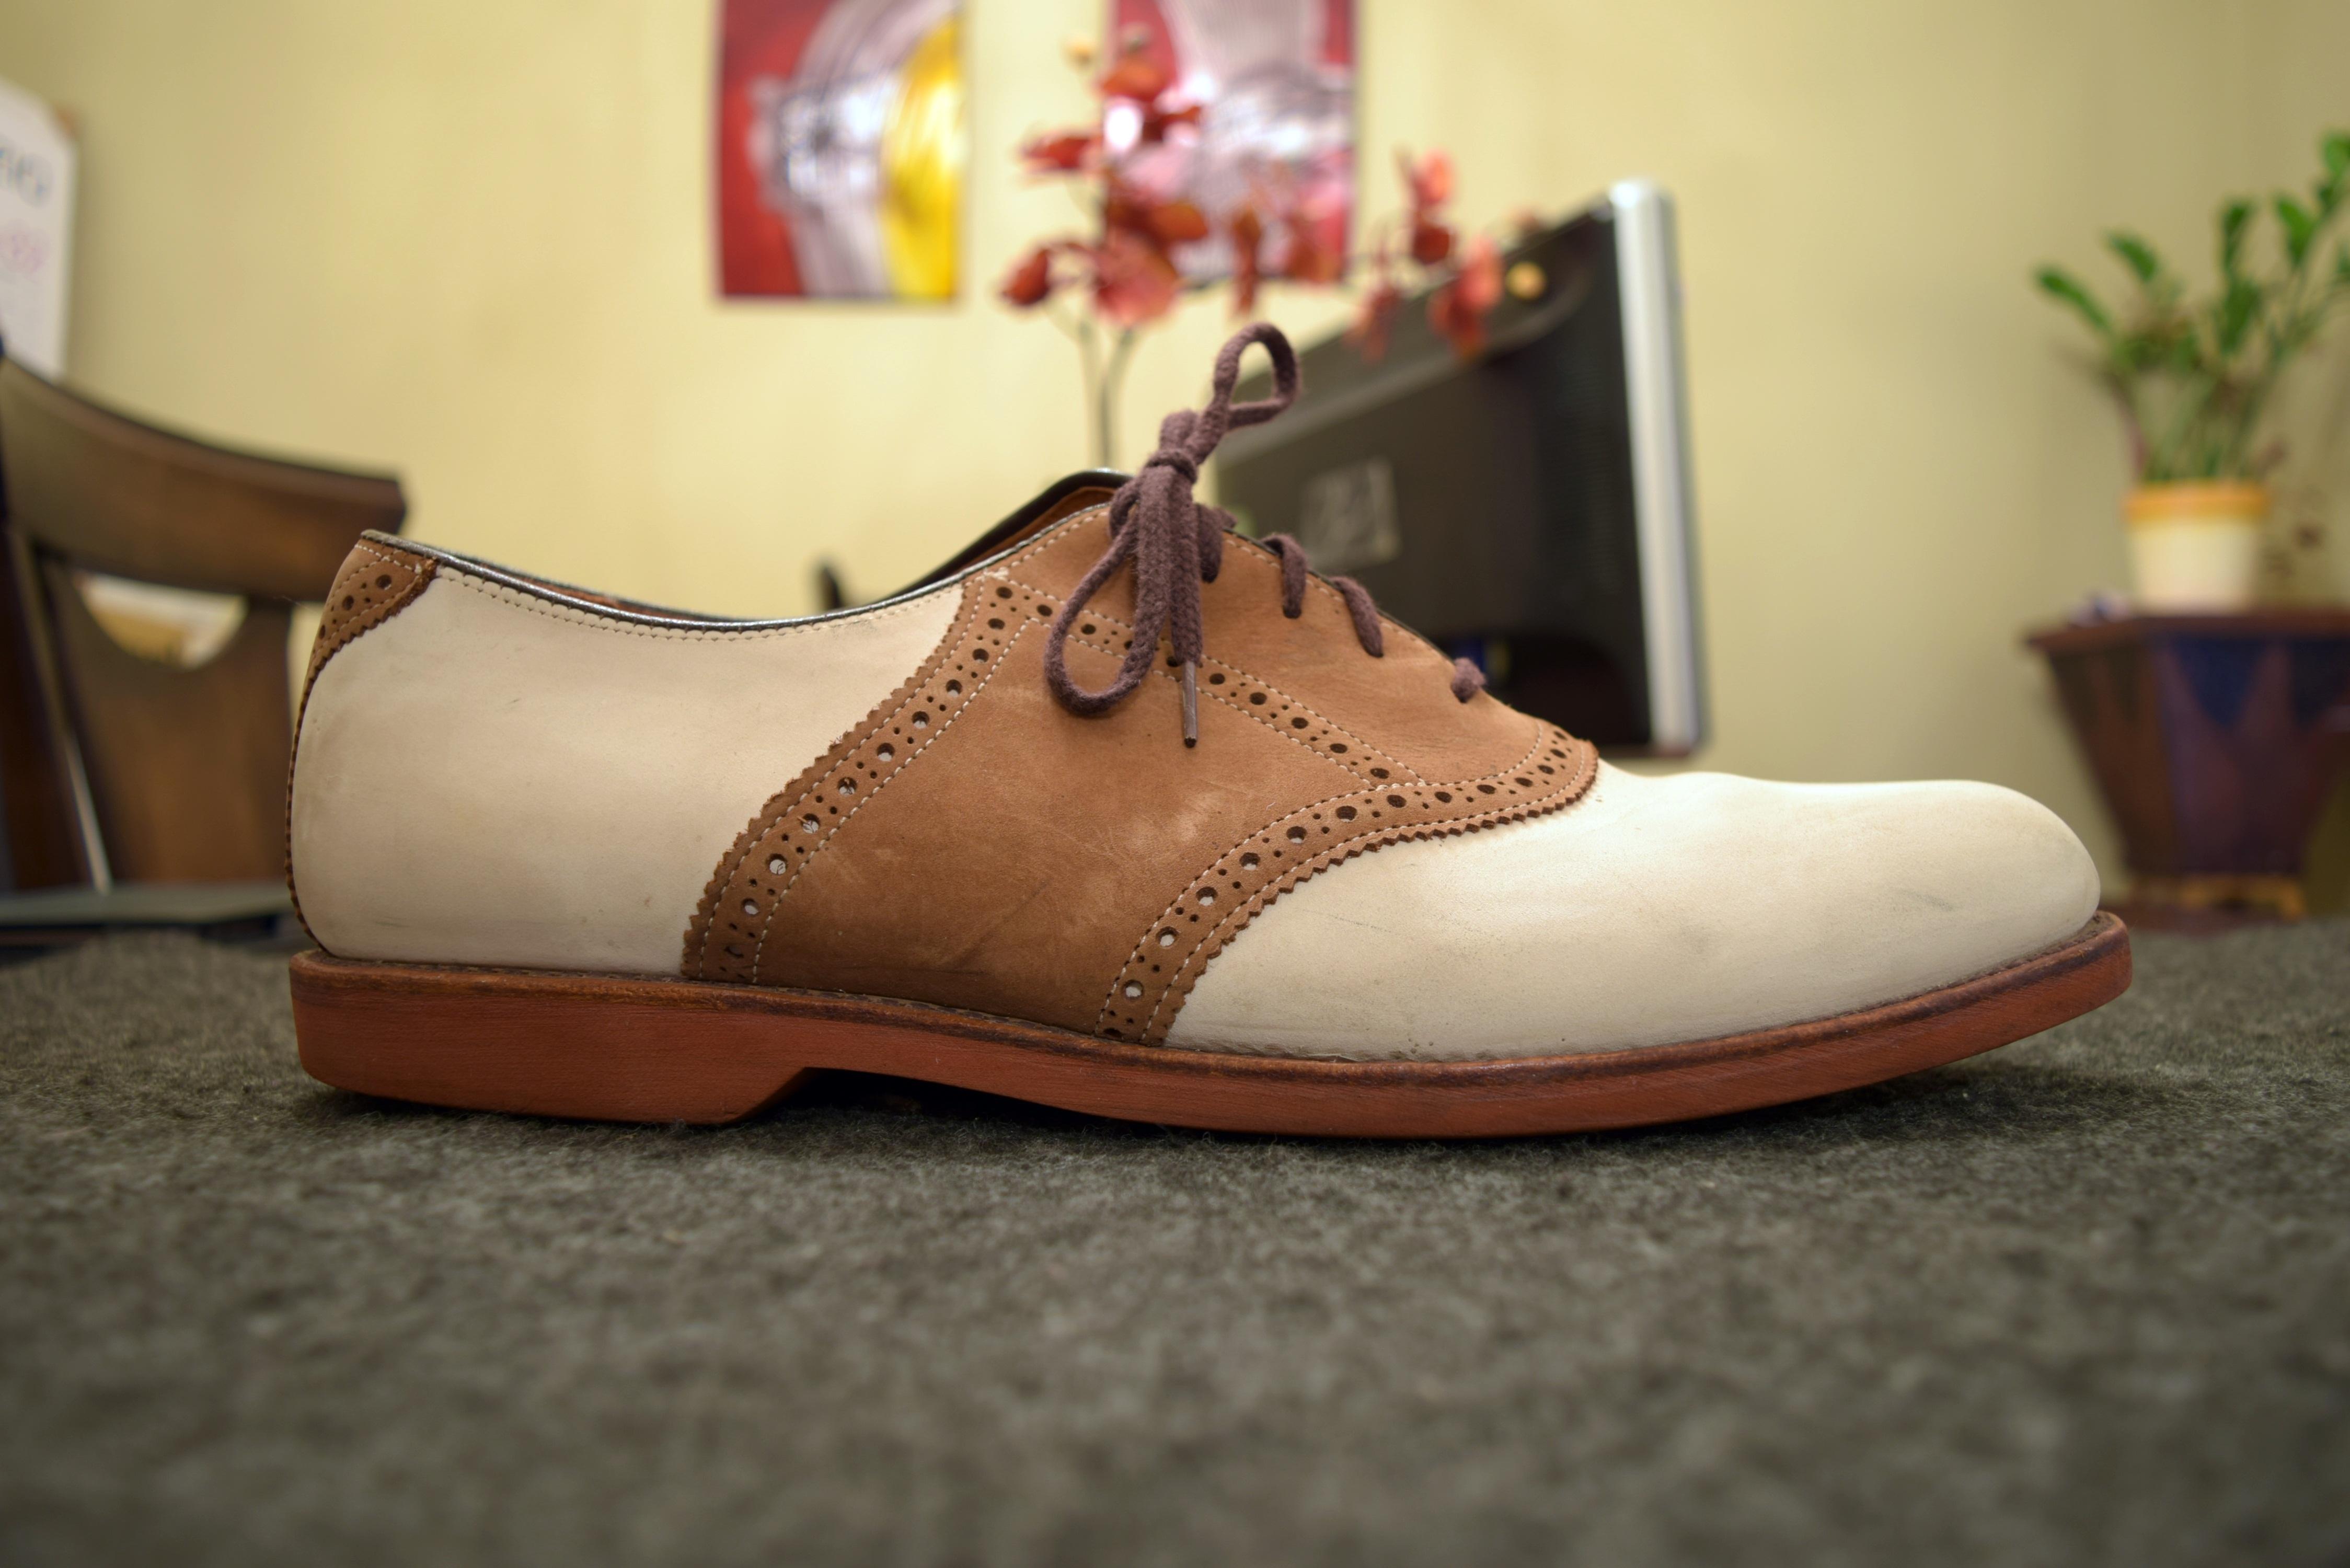 leather and nubuck oxford saddle shoes white tassel